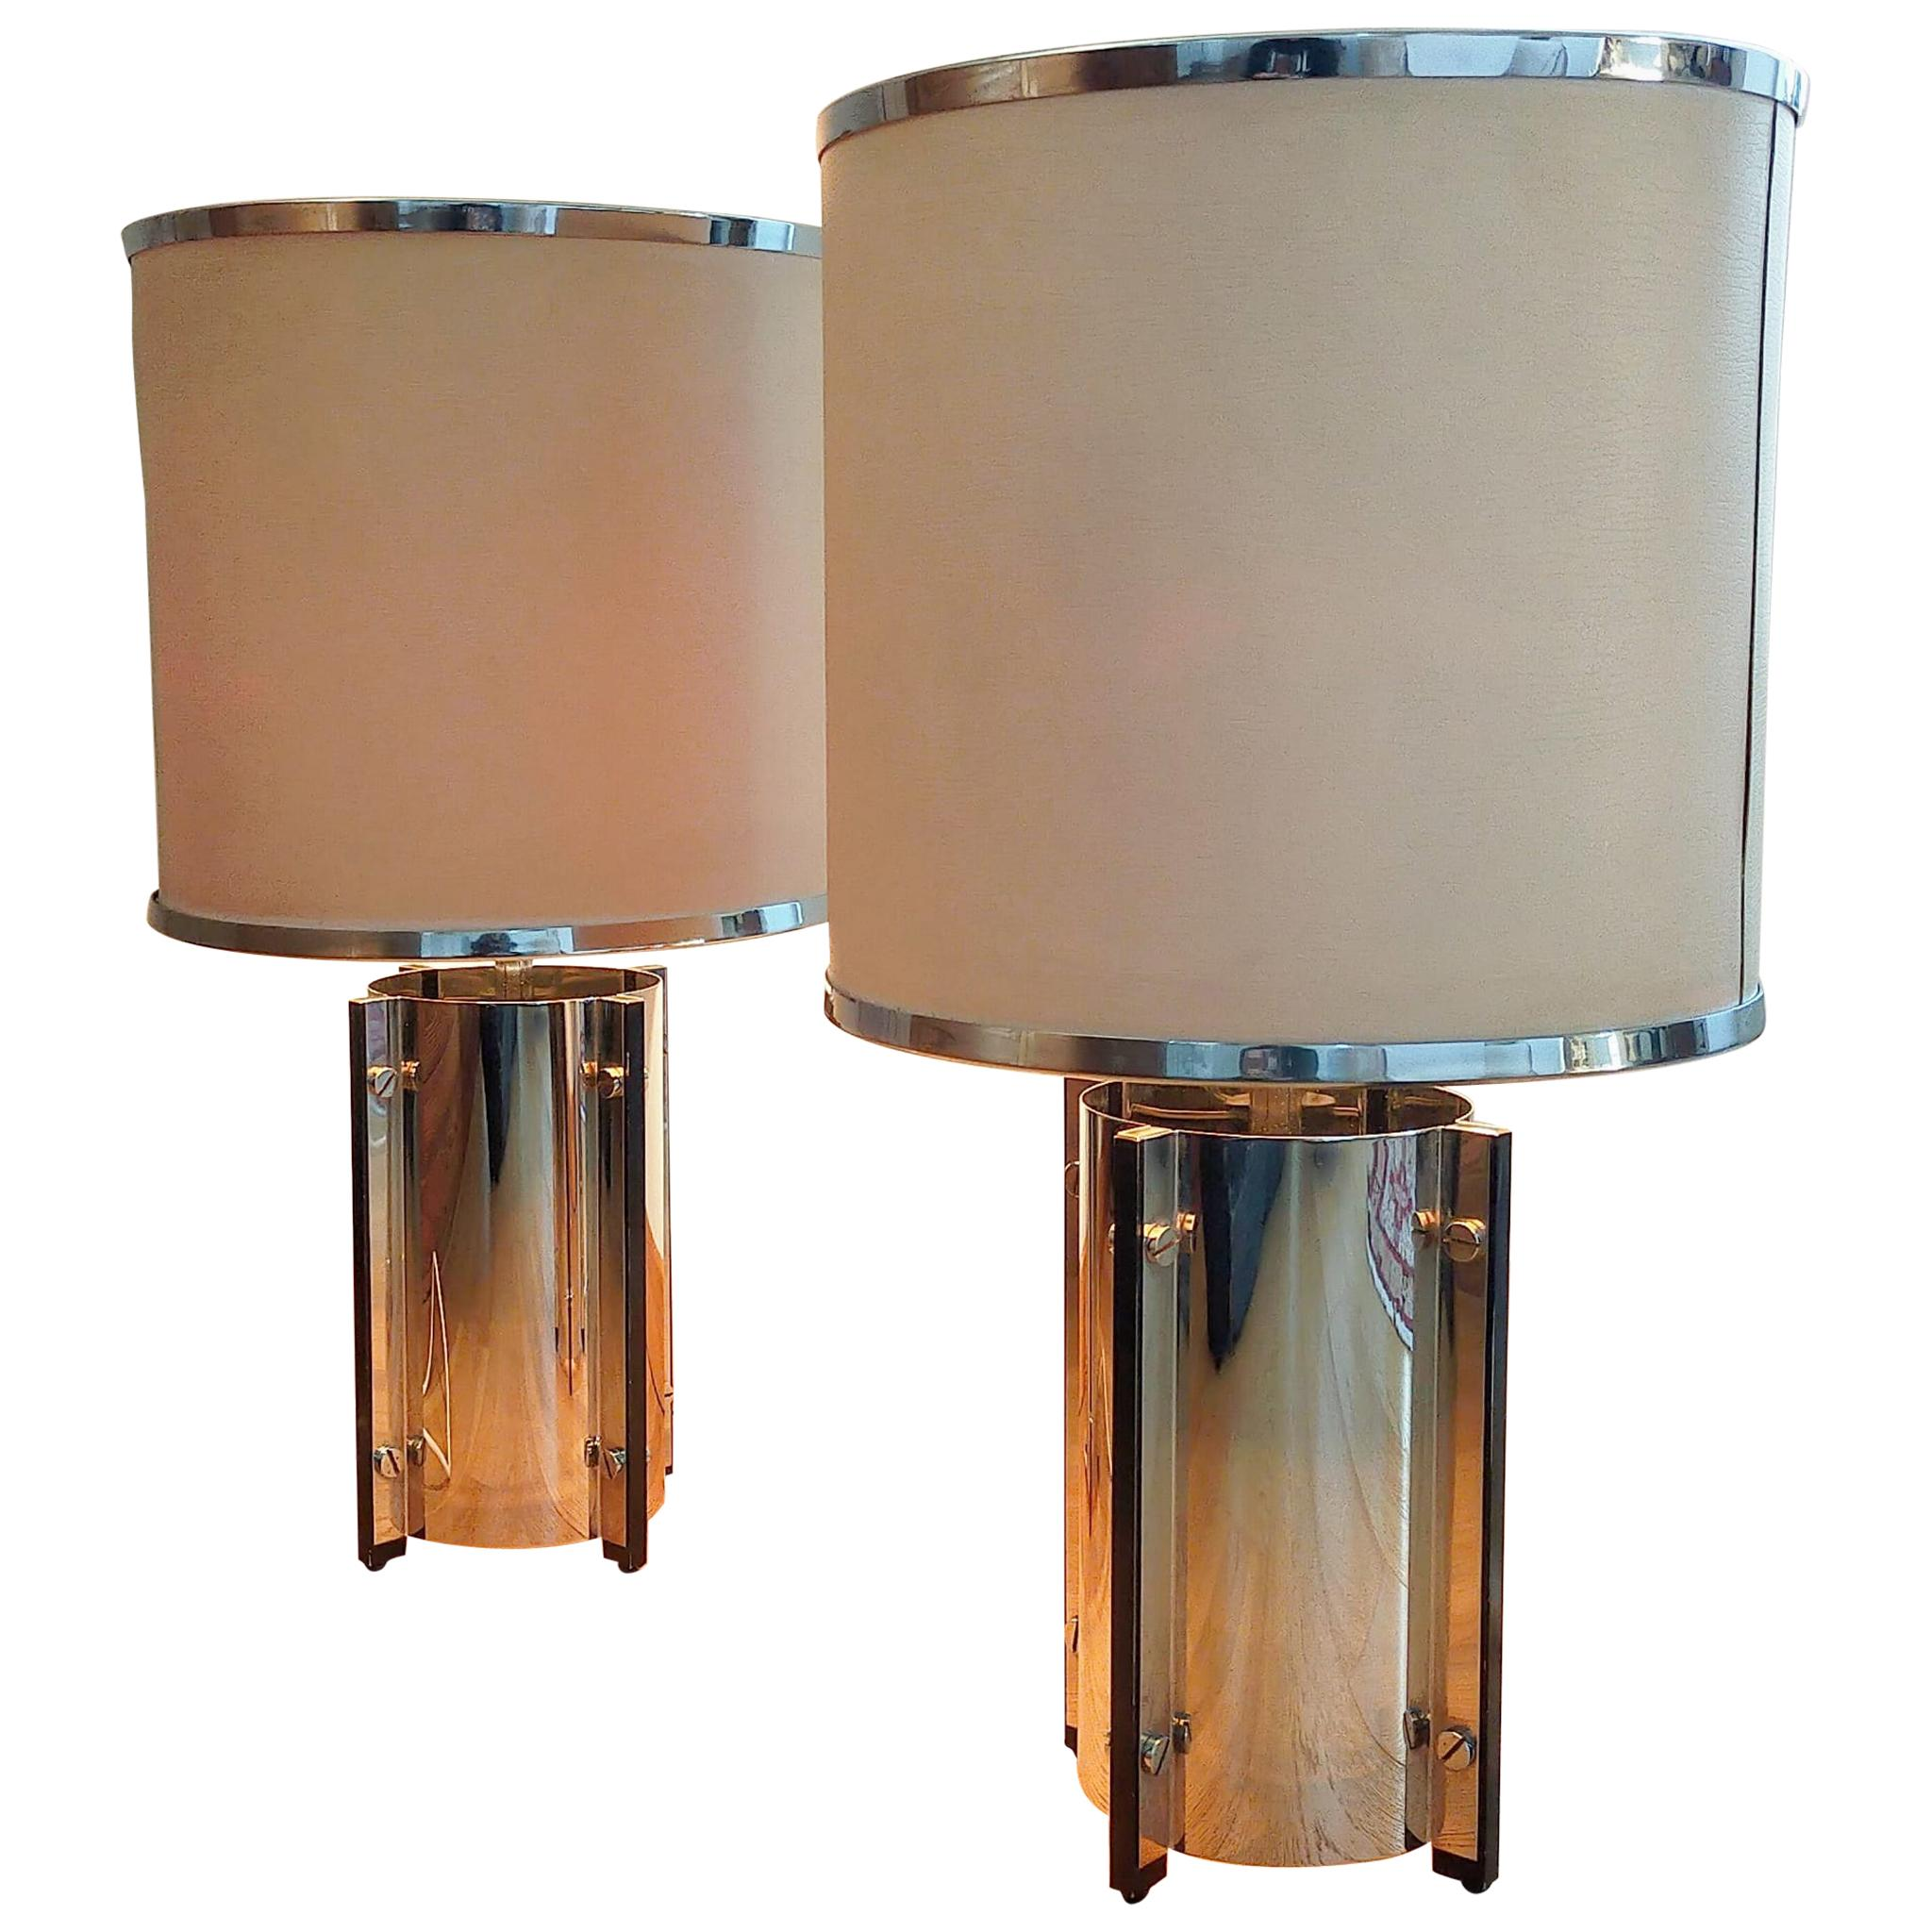 Pair of Table Lamps by Gaetano Sciolari, Italy, 1970s